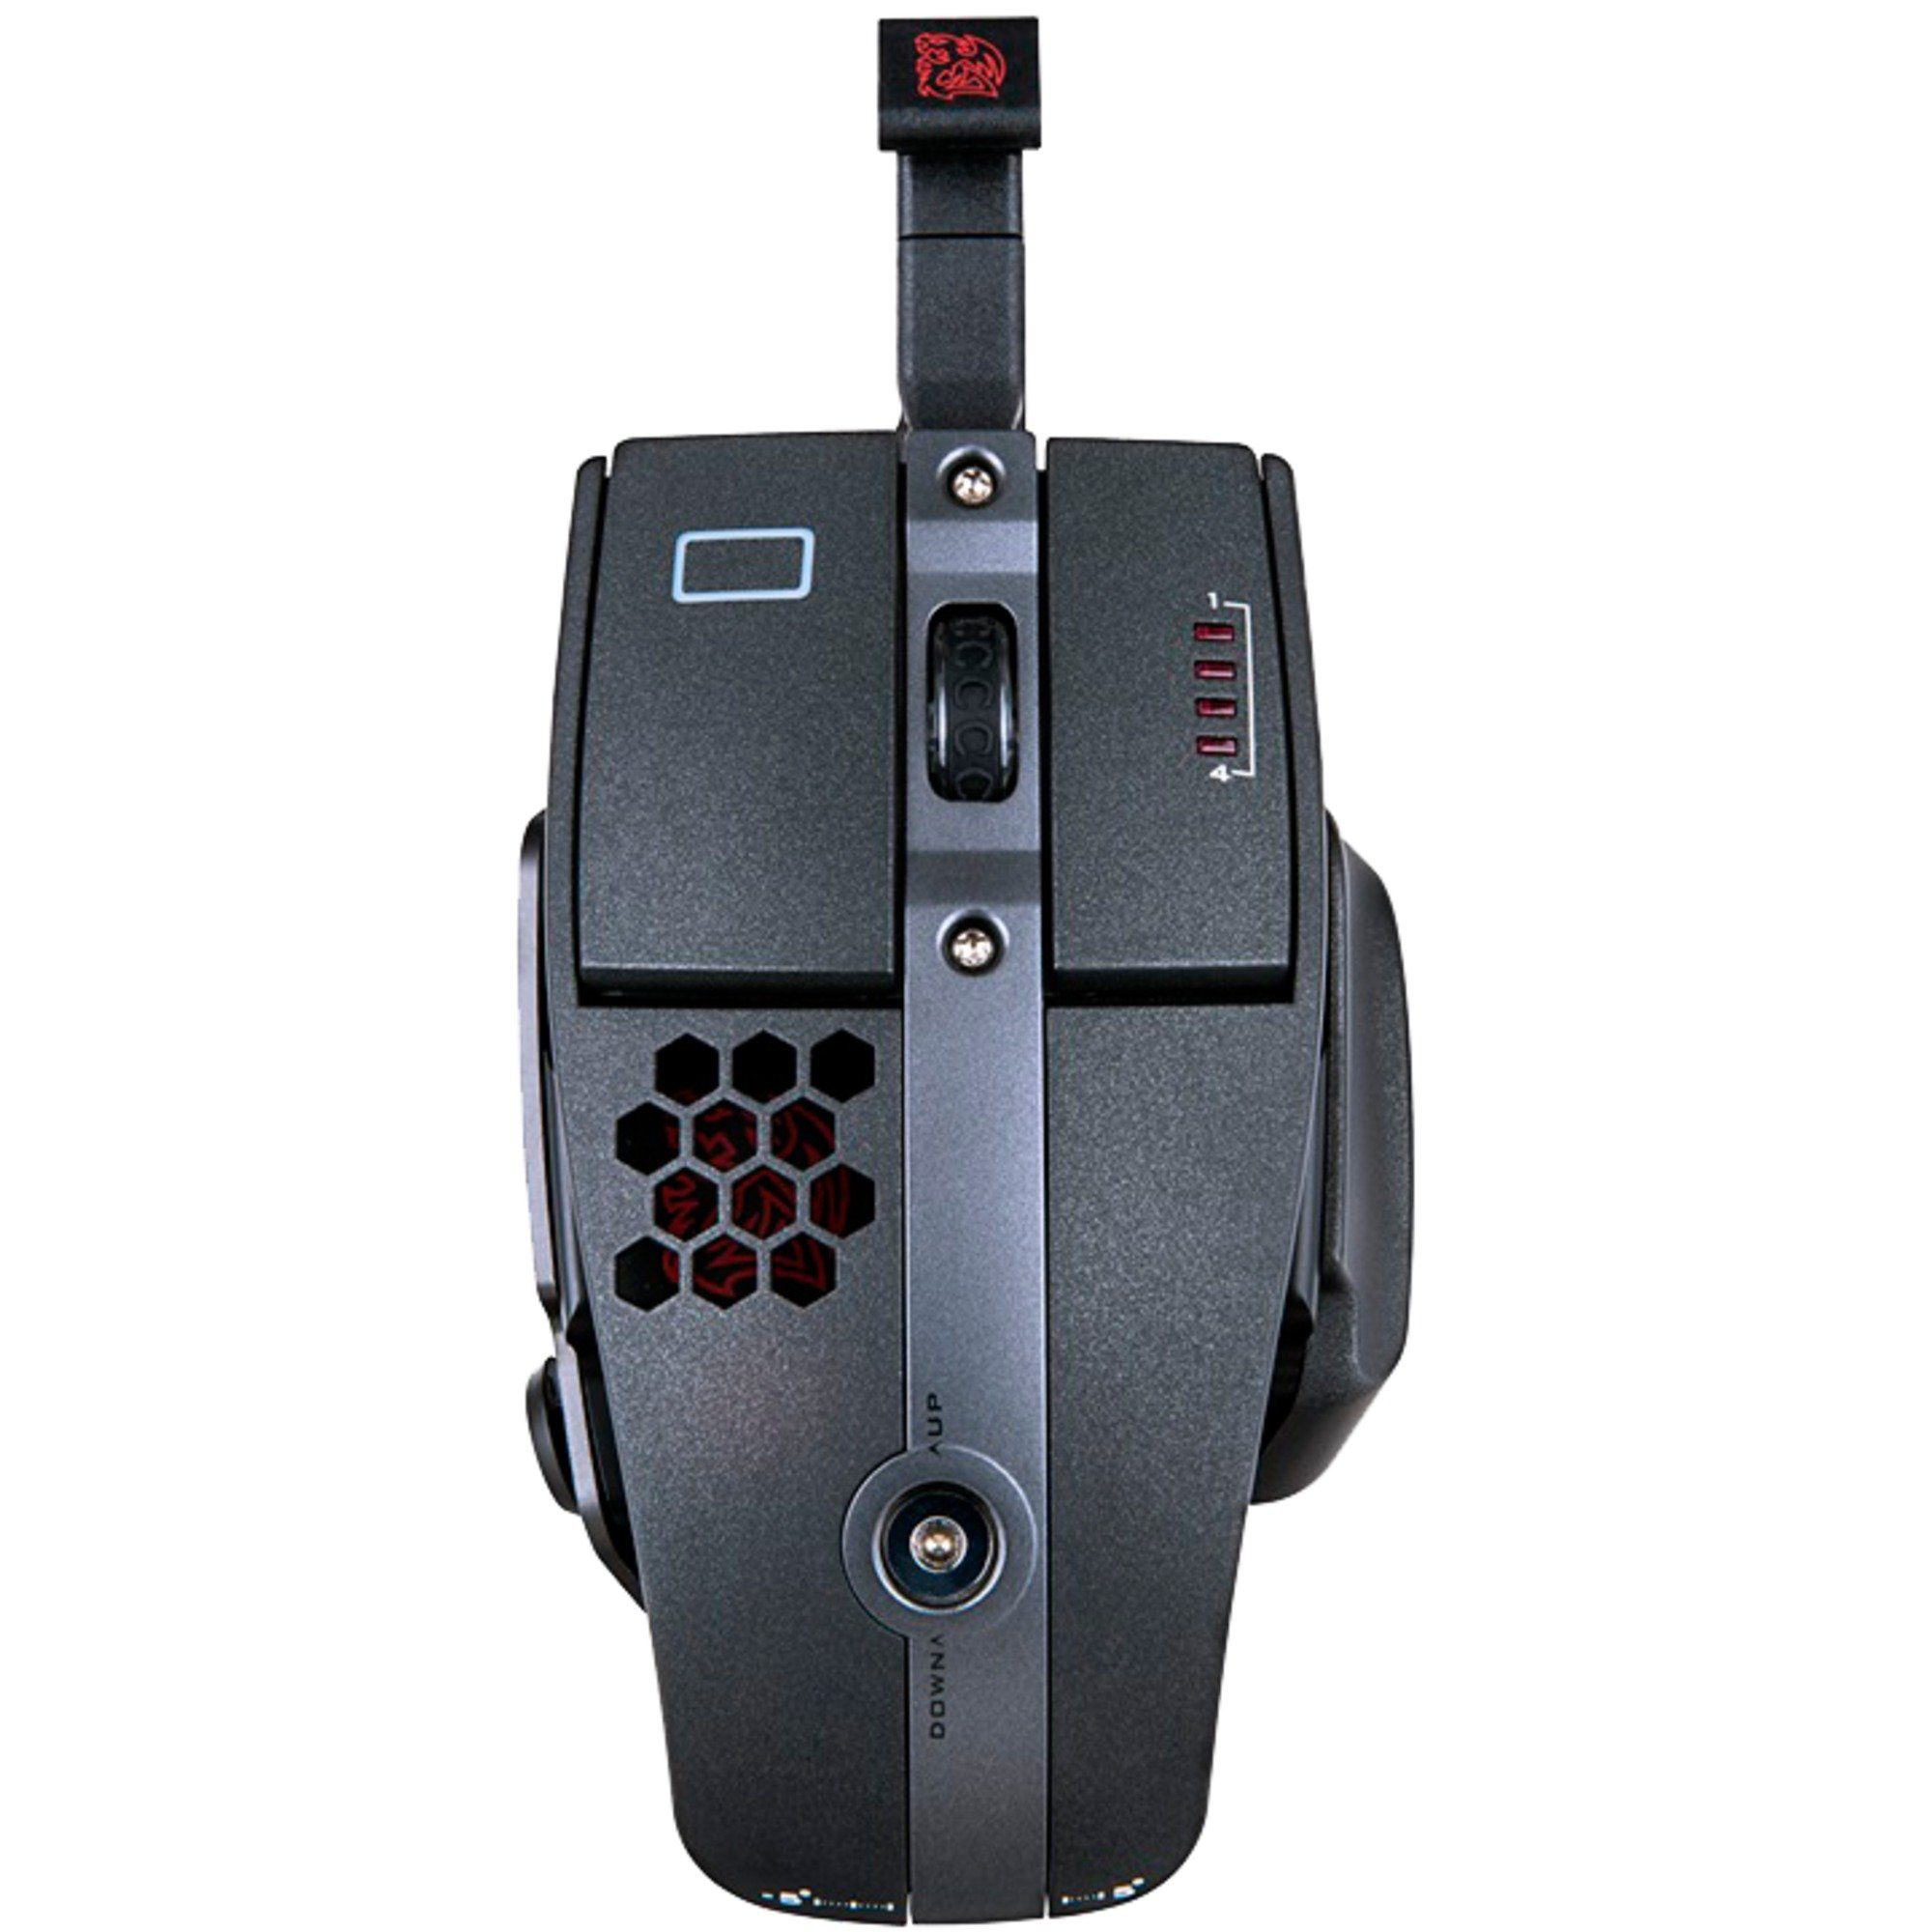 Tt eSPORTS Maus »Level 10M Hybrid Advanced«